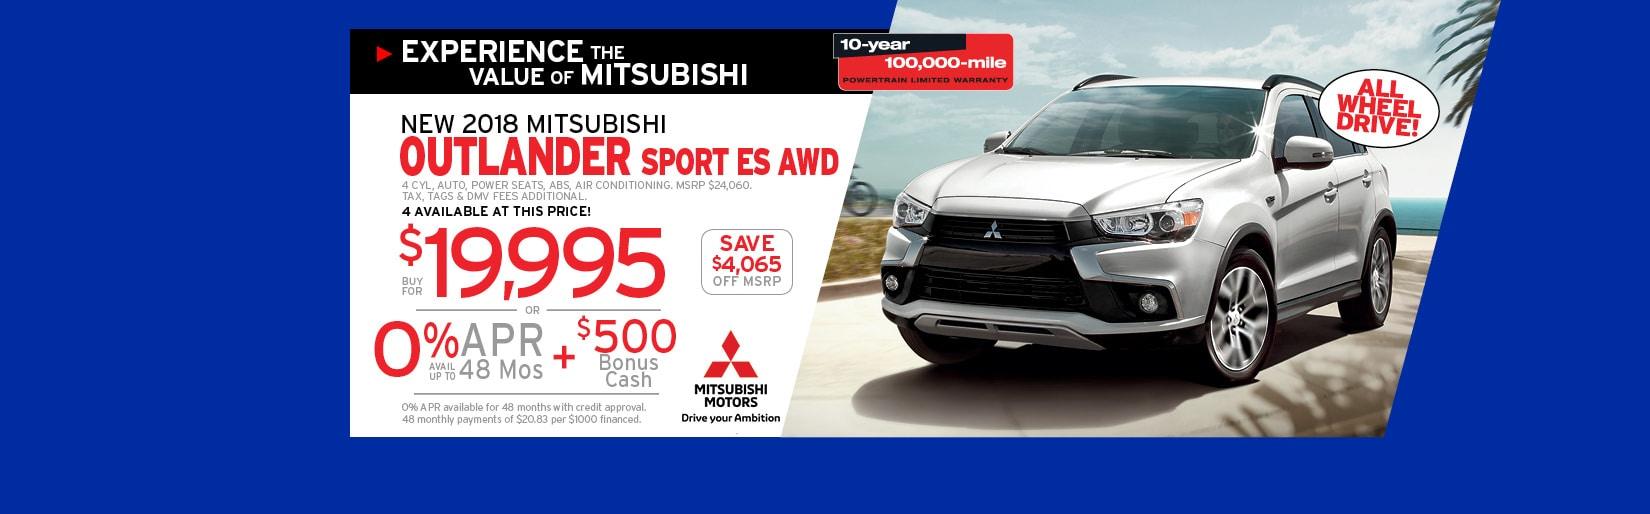 Long Island NY Mitsubishi Dealer Smith Haven Mitsubishi - Mitsubishi motors phone number